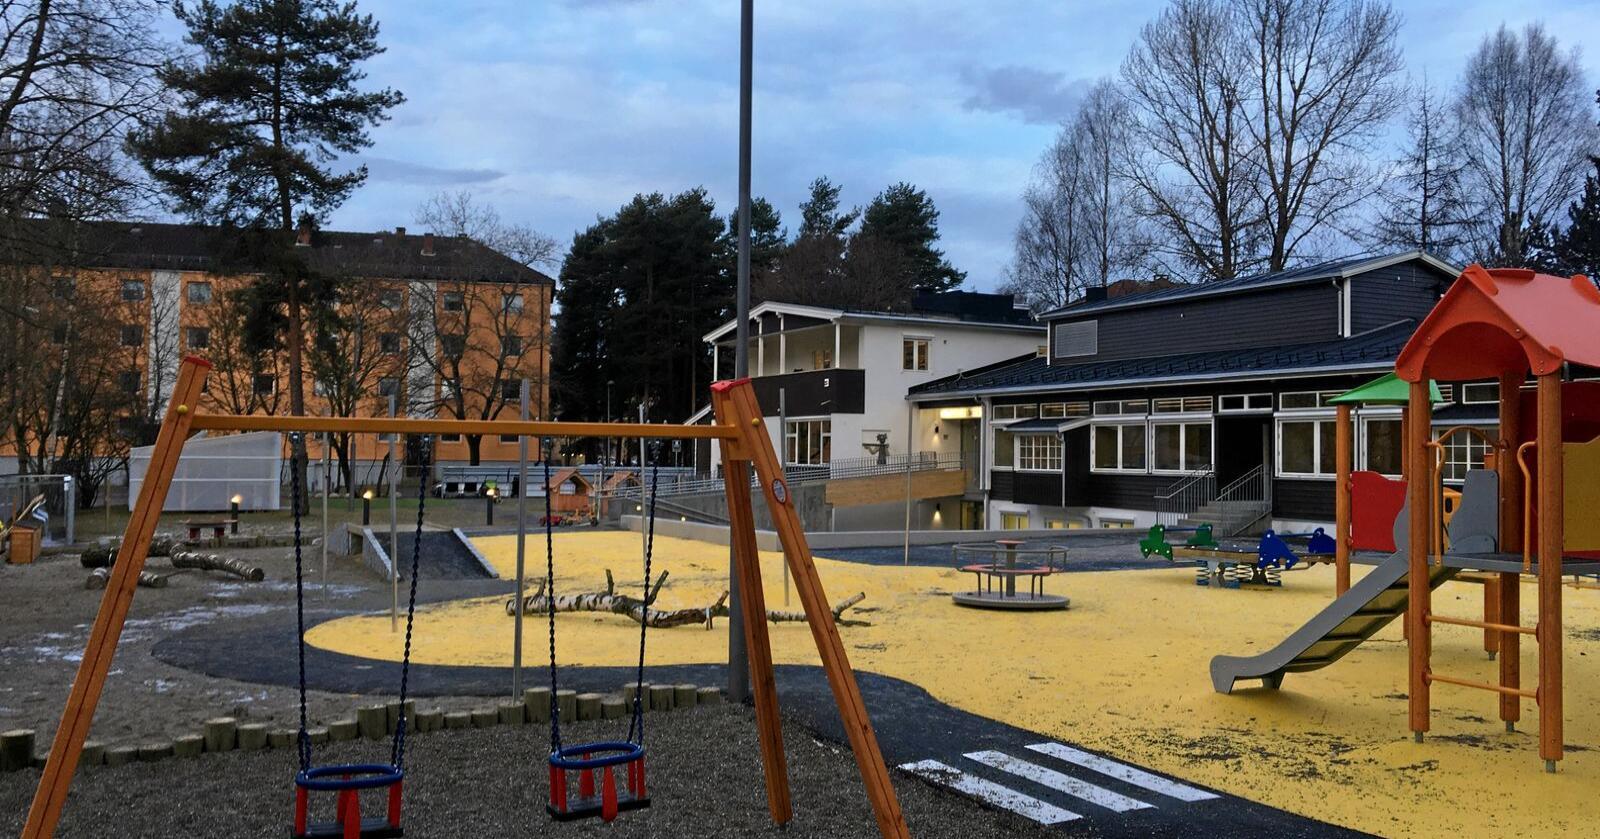 Gummiasfalt preger stadig flere uteområder i norske skoler og barnehager. Foto: Cowi AS